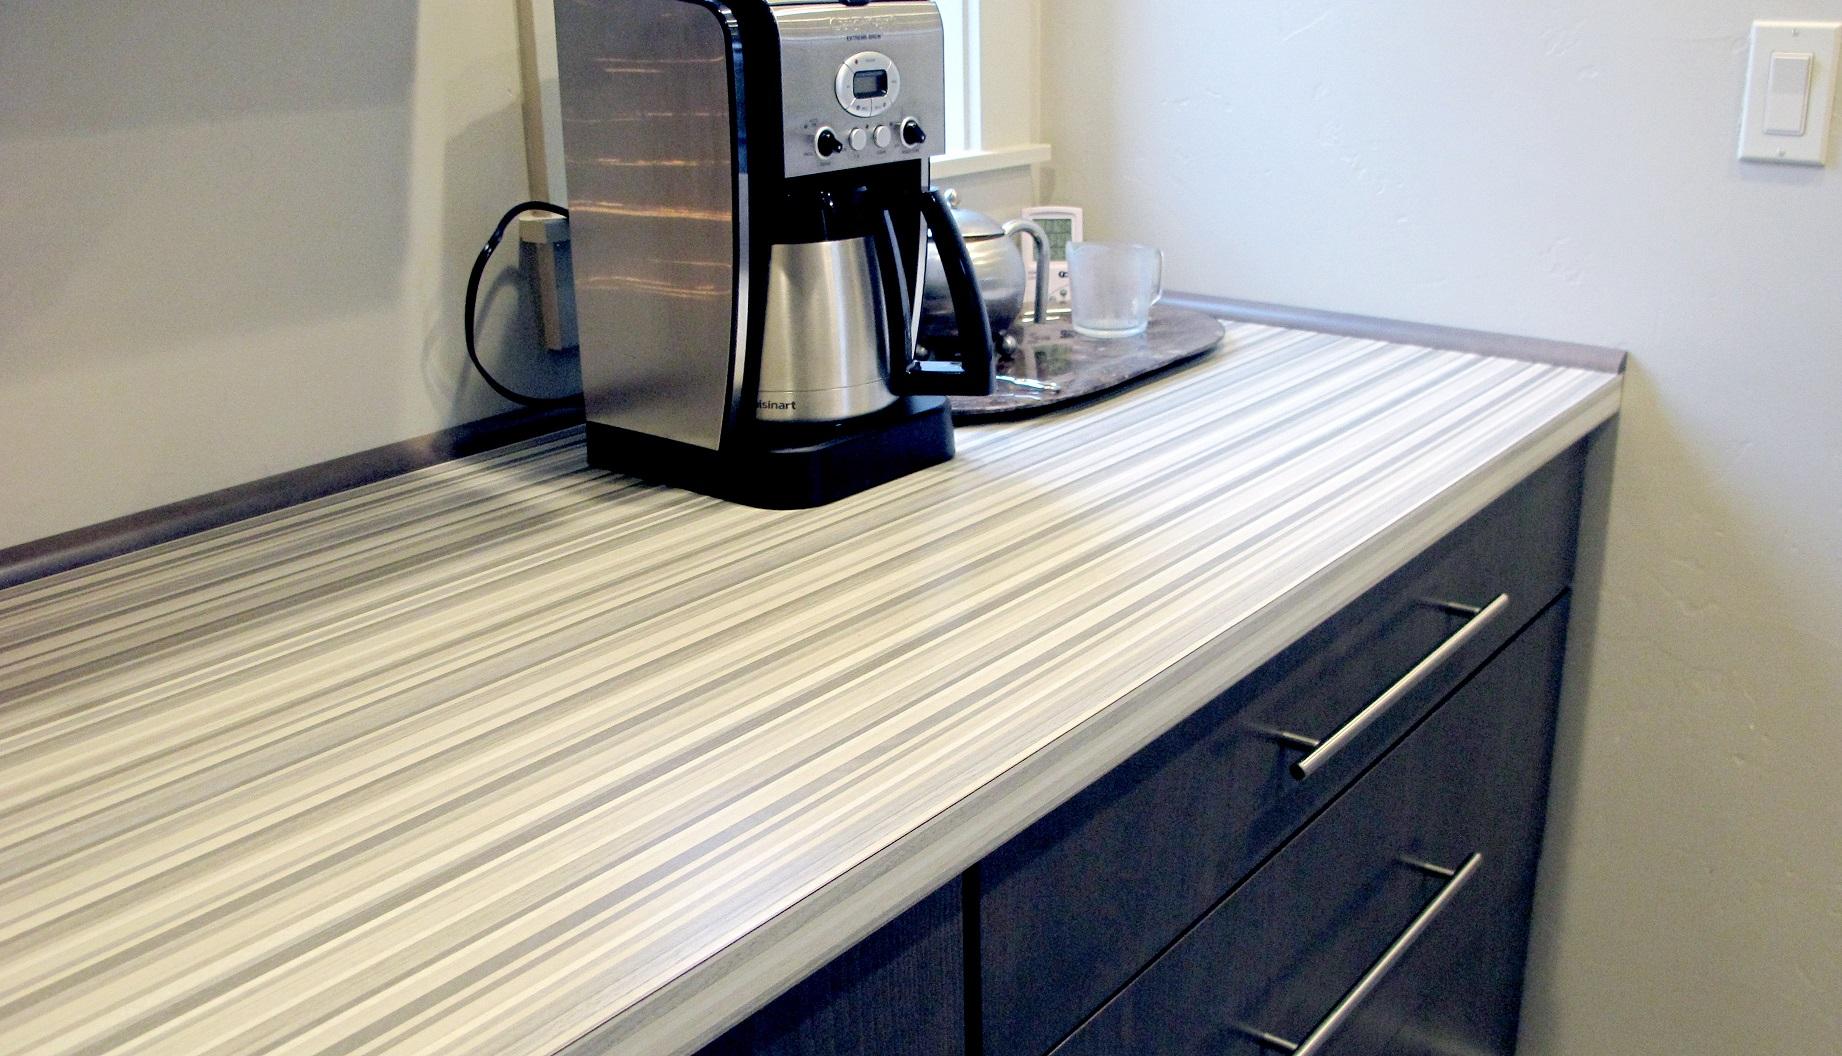 Laminate Countertop Formica Ashen Ribbonwood Linear Stripe Wood Grain Contemporary Modern Sleek Bistro Bar Cabinet Brushed